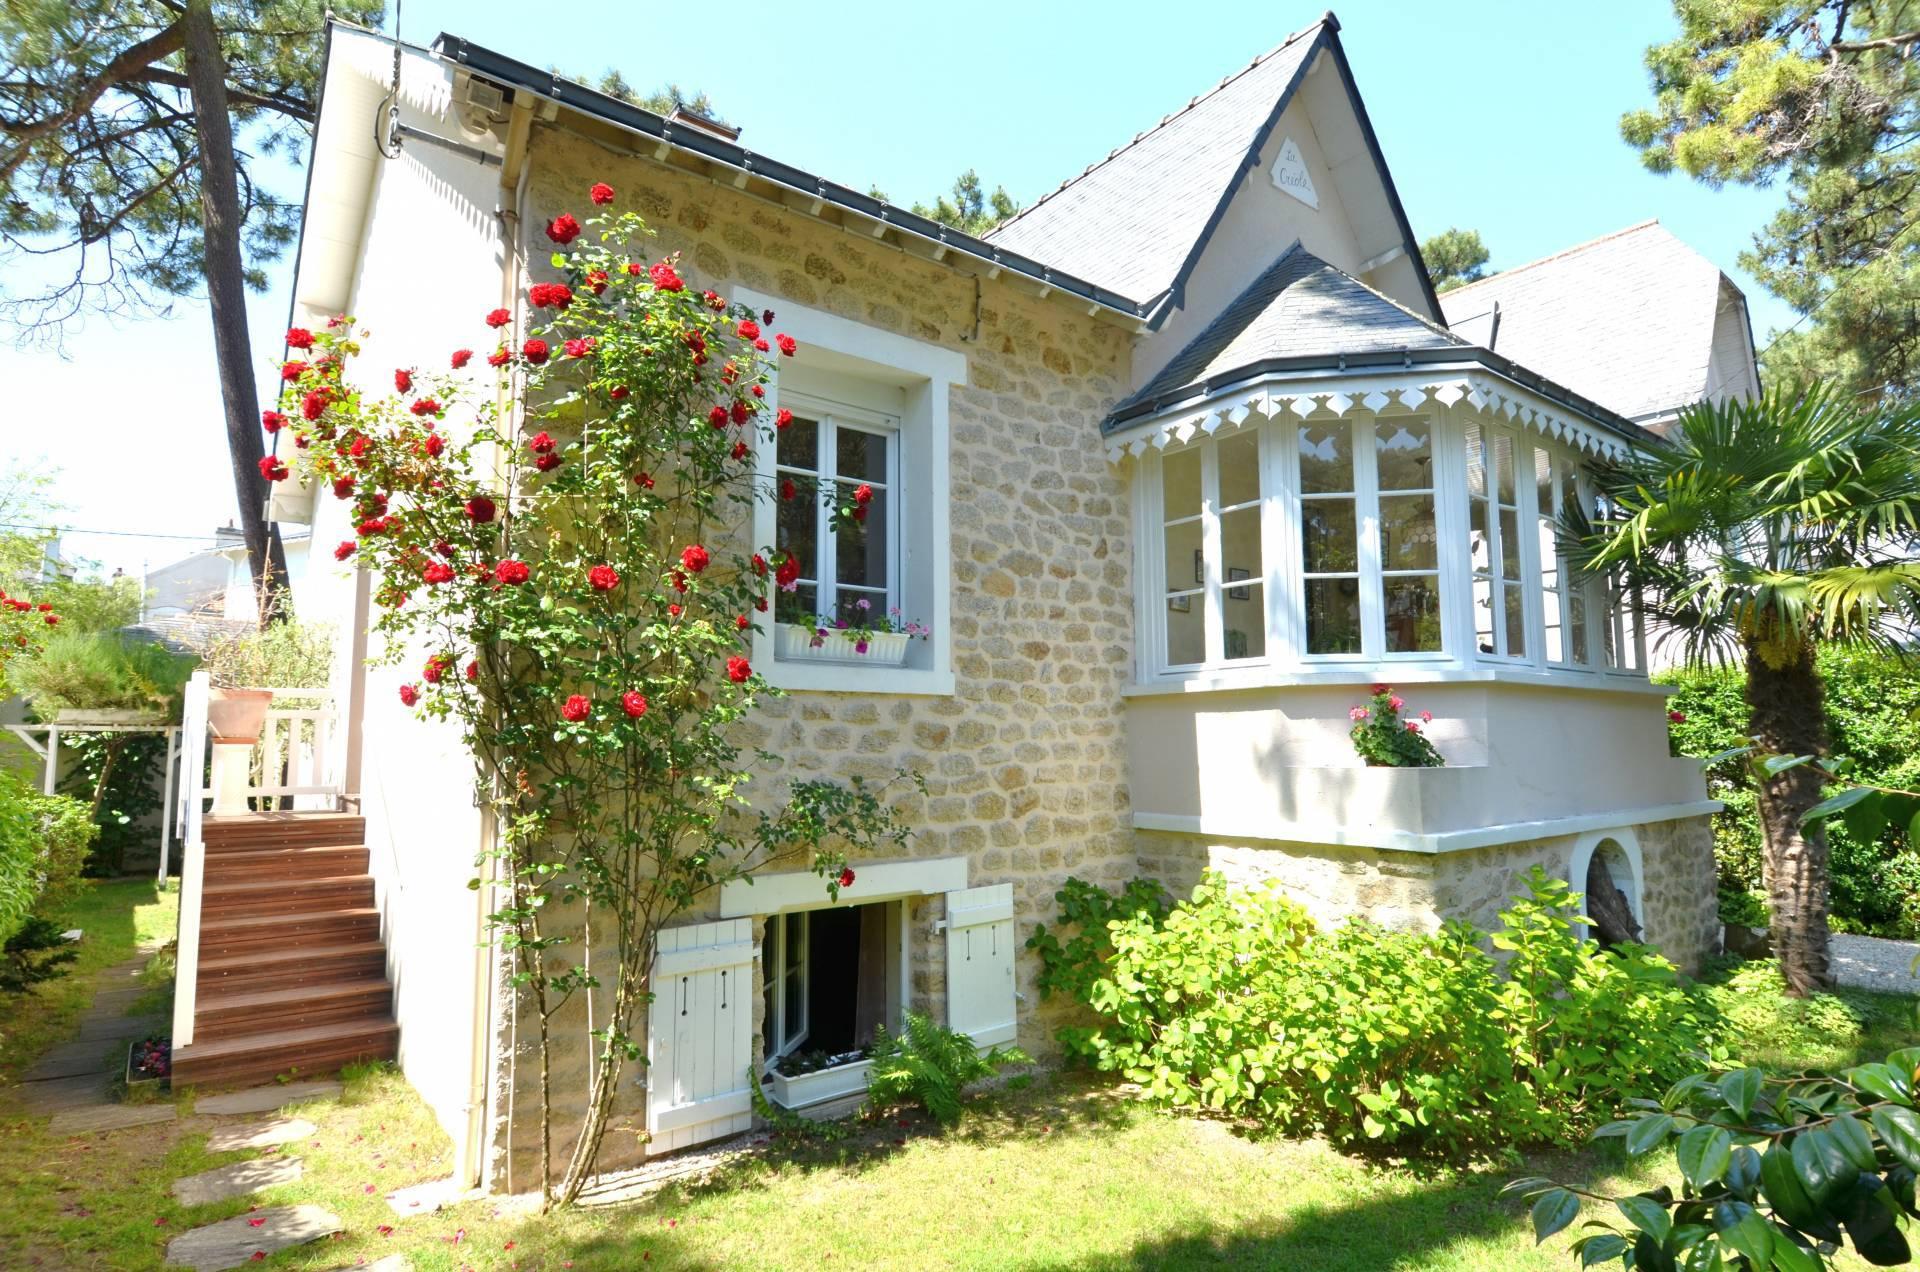 La Baule France  City pictures : Villa in the resort of La Baule, France wallpapers and images ...